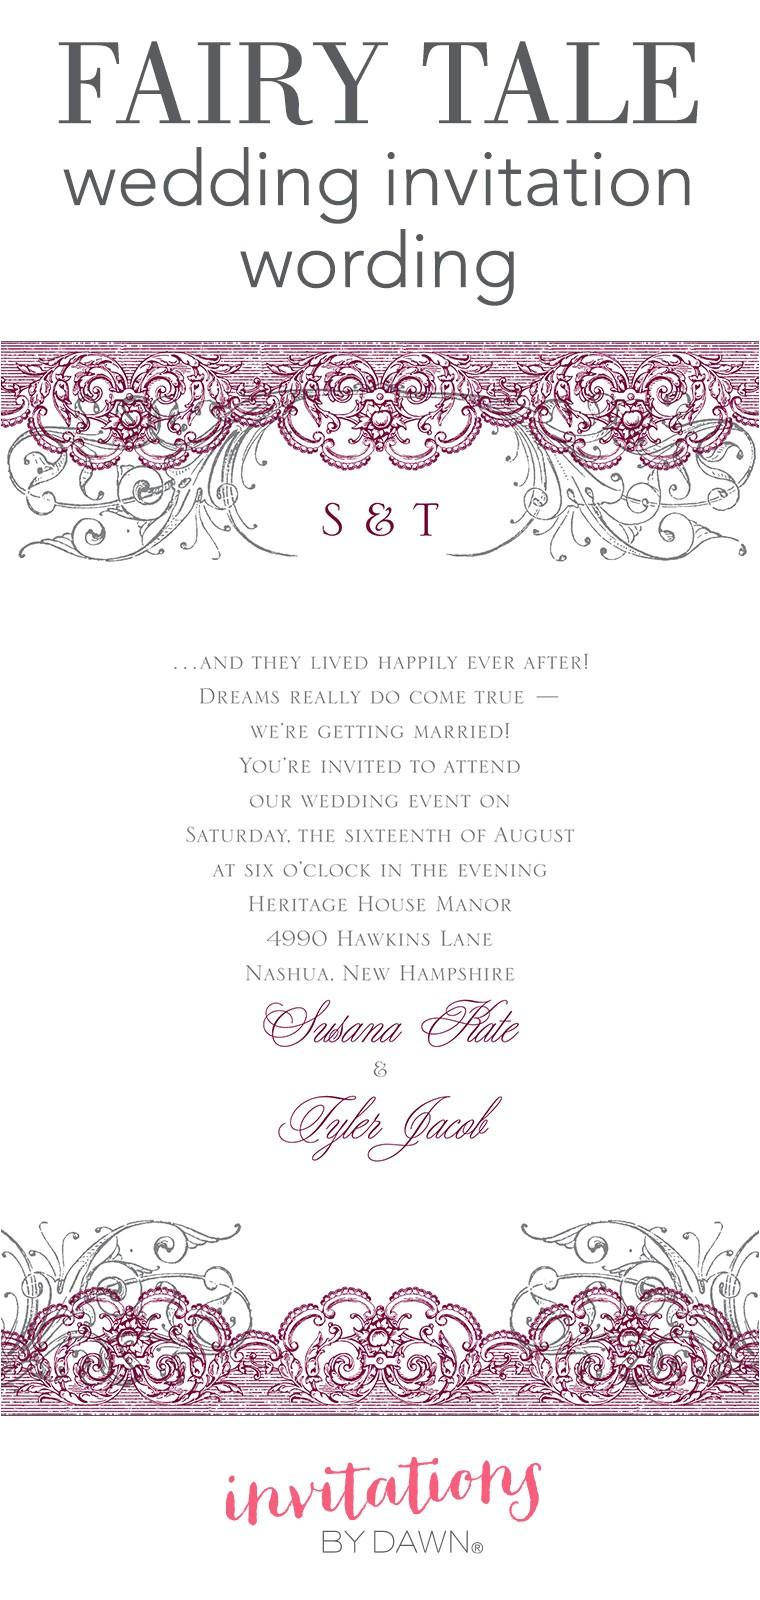 Love Marriage Wedding Invitation Wording Fairy Tale Wedding Invitation Wording Invitations by Dawn